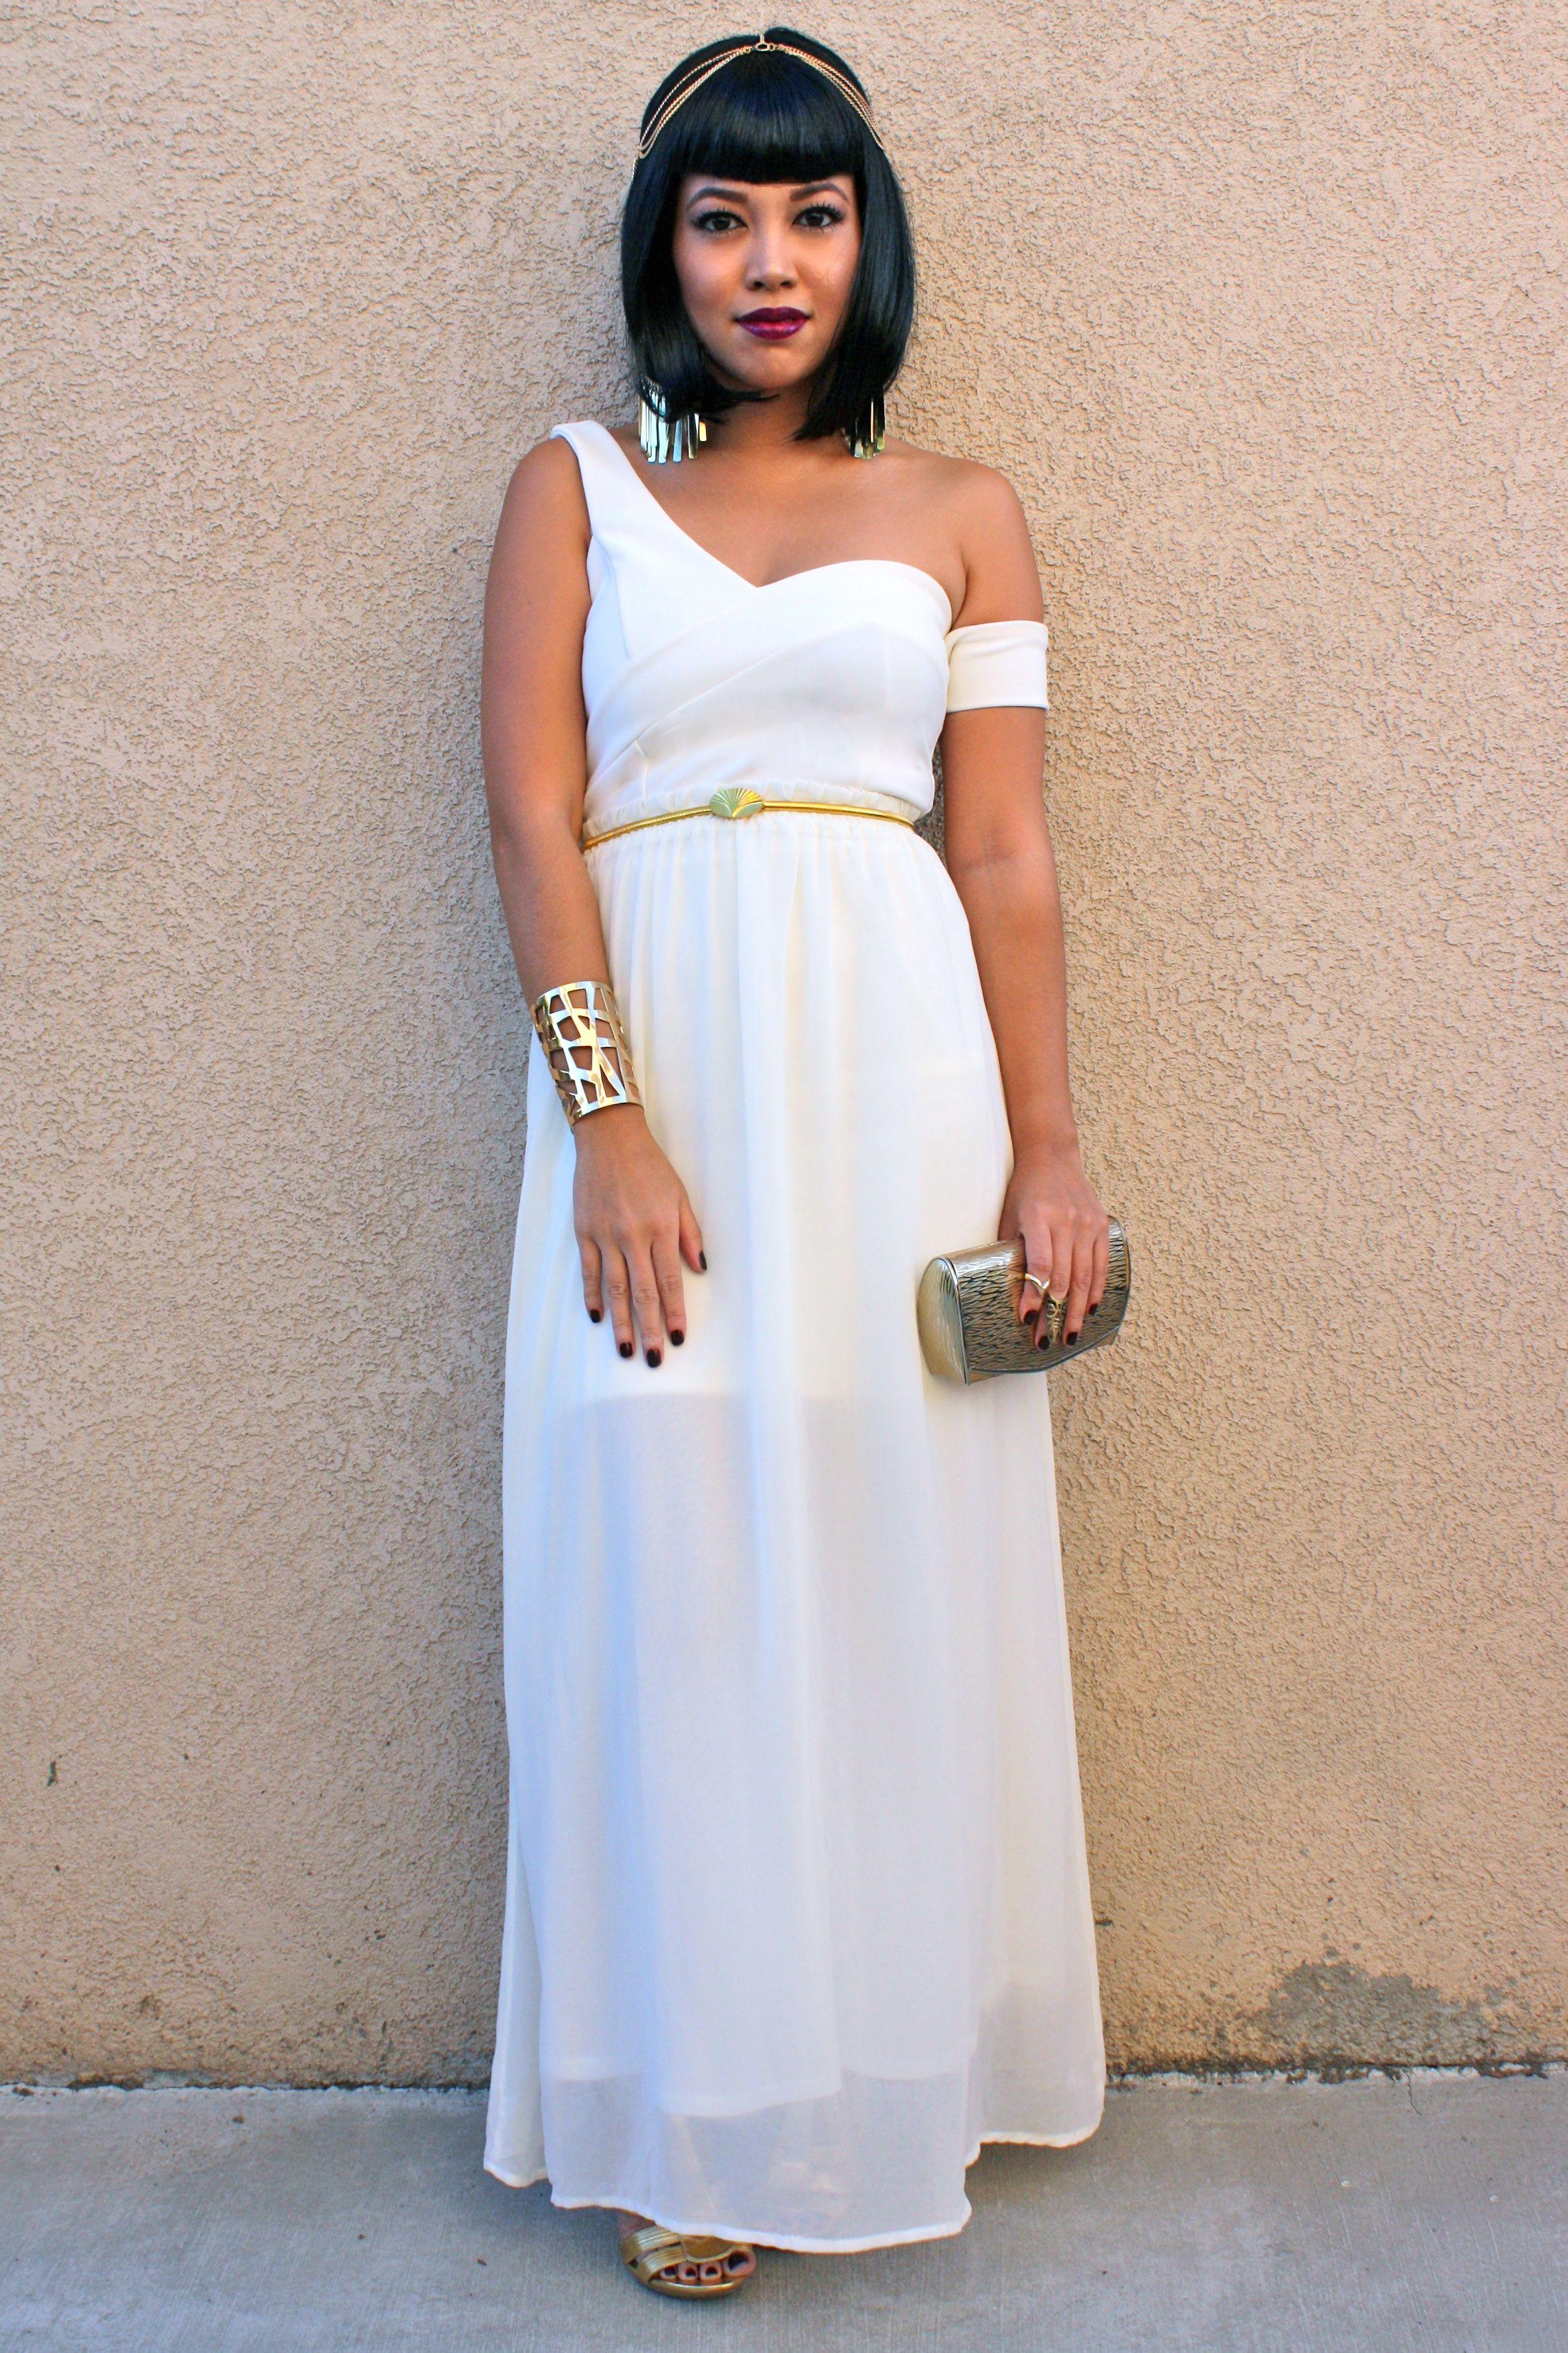 Halloweek Cleopatra Coming Atcha Goddess Costume Goddess Costume Diy Egyptian Goddess Costume